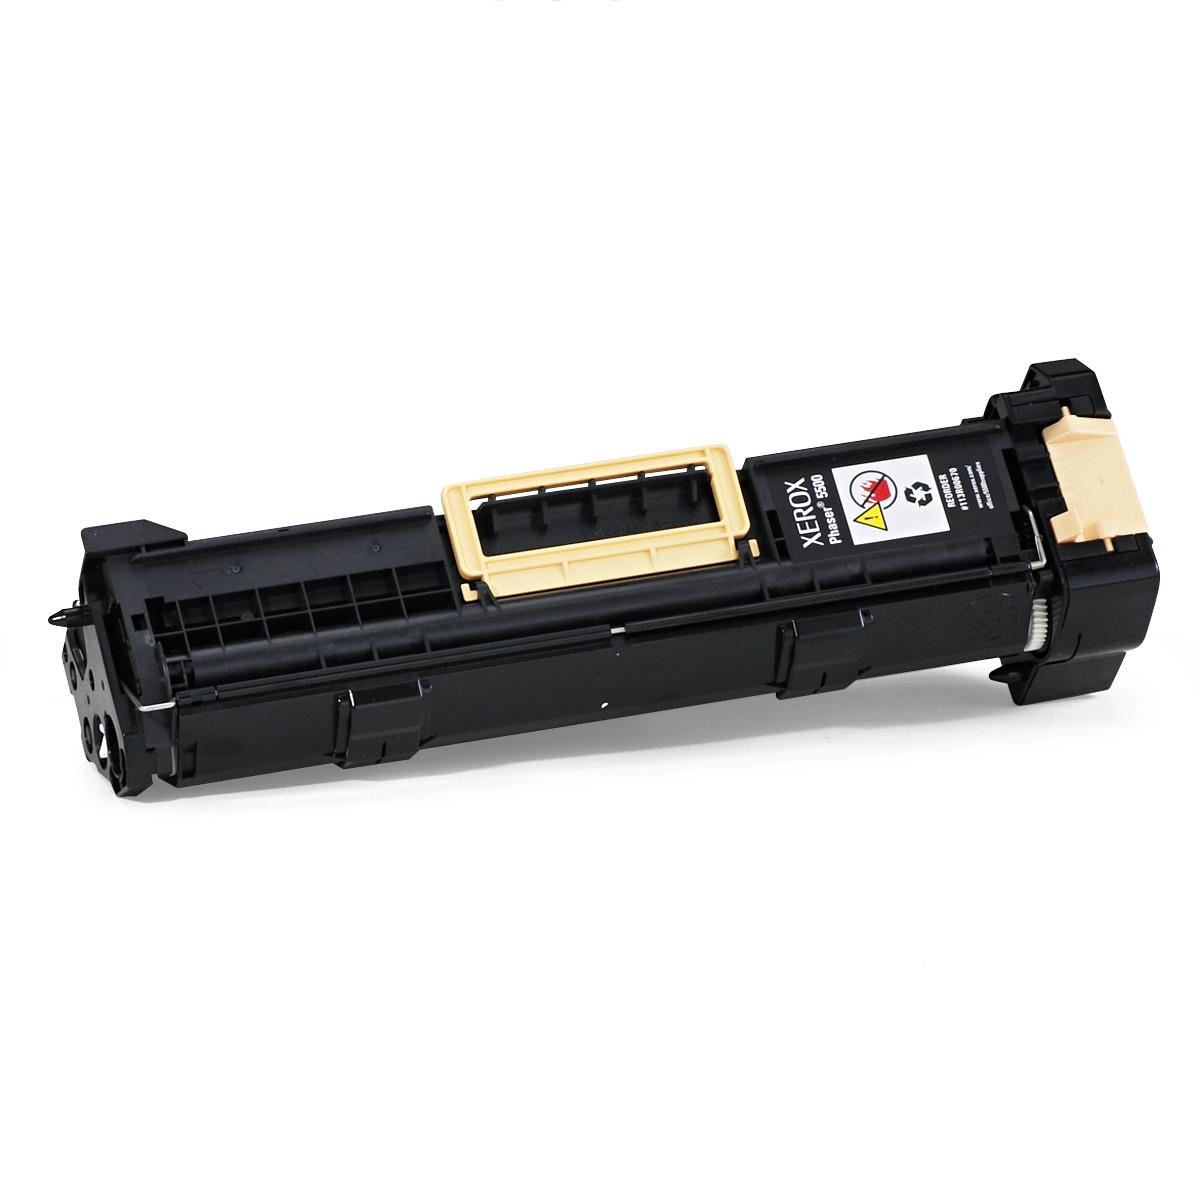 Xerox 113R00670 Drum Cartridge, 60000 Page-Yield, Black by Xerox